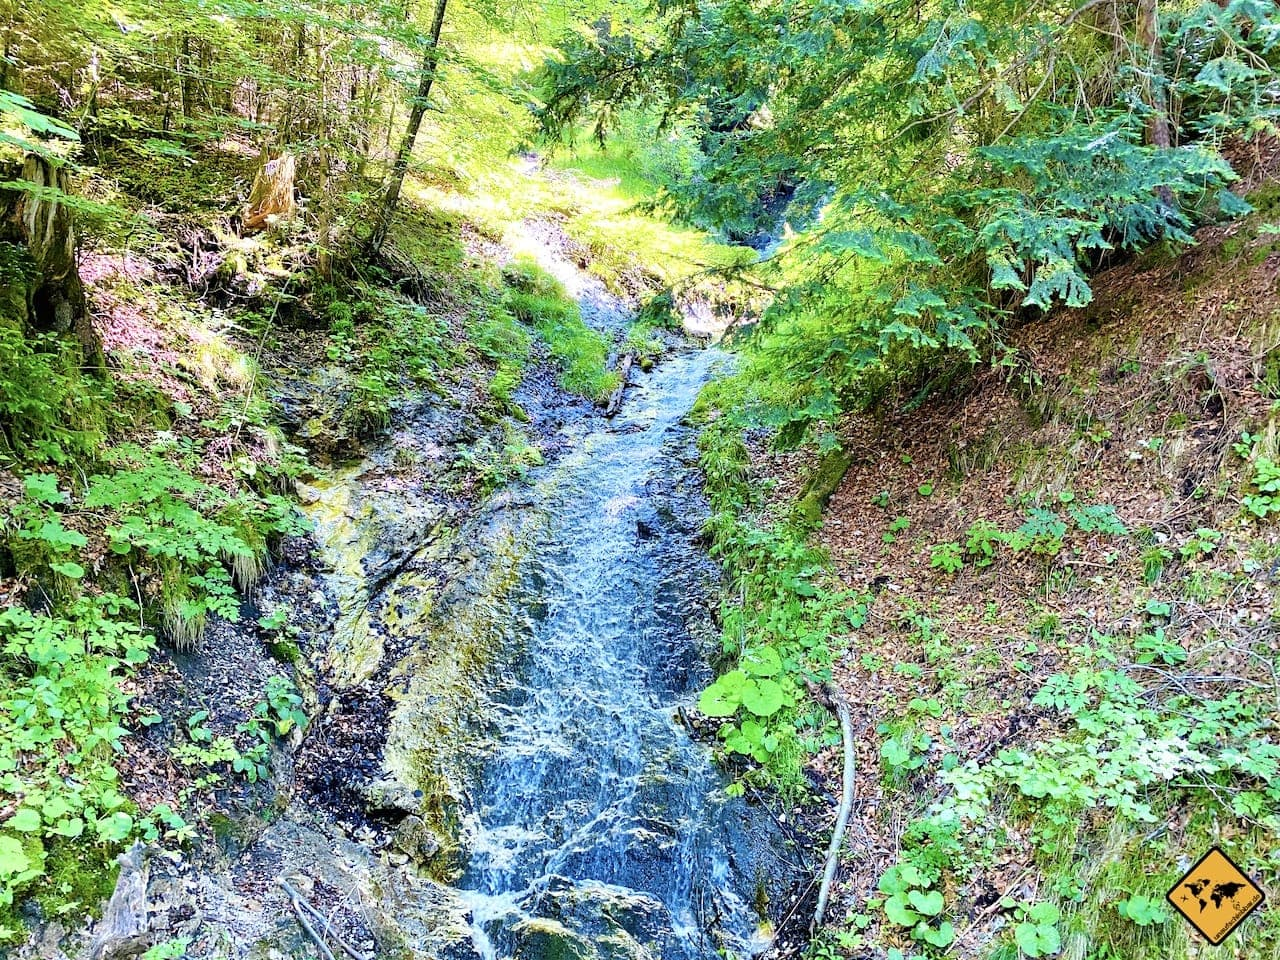 Wassergerinsel Weg Schloss Neuschwanstein